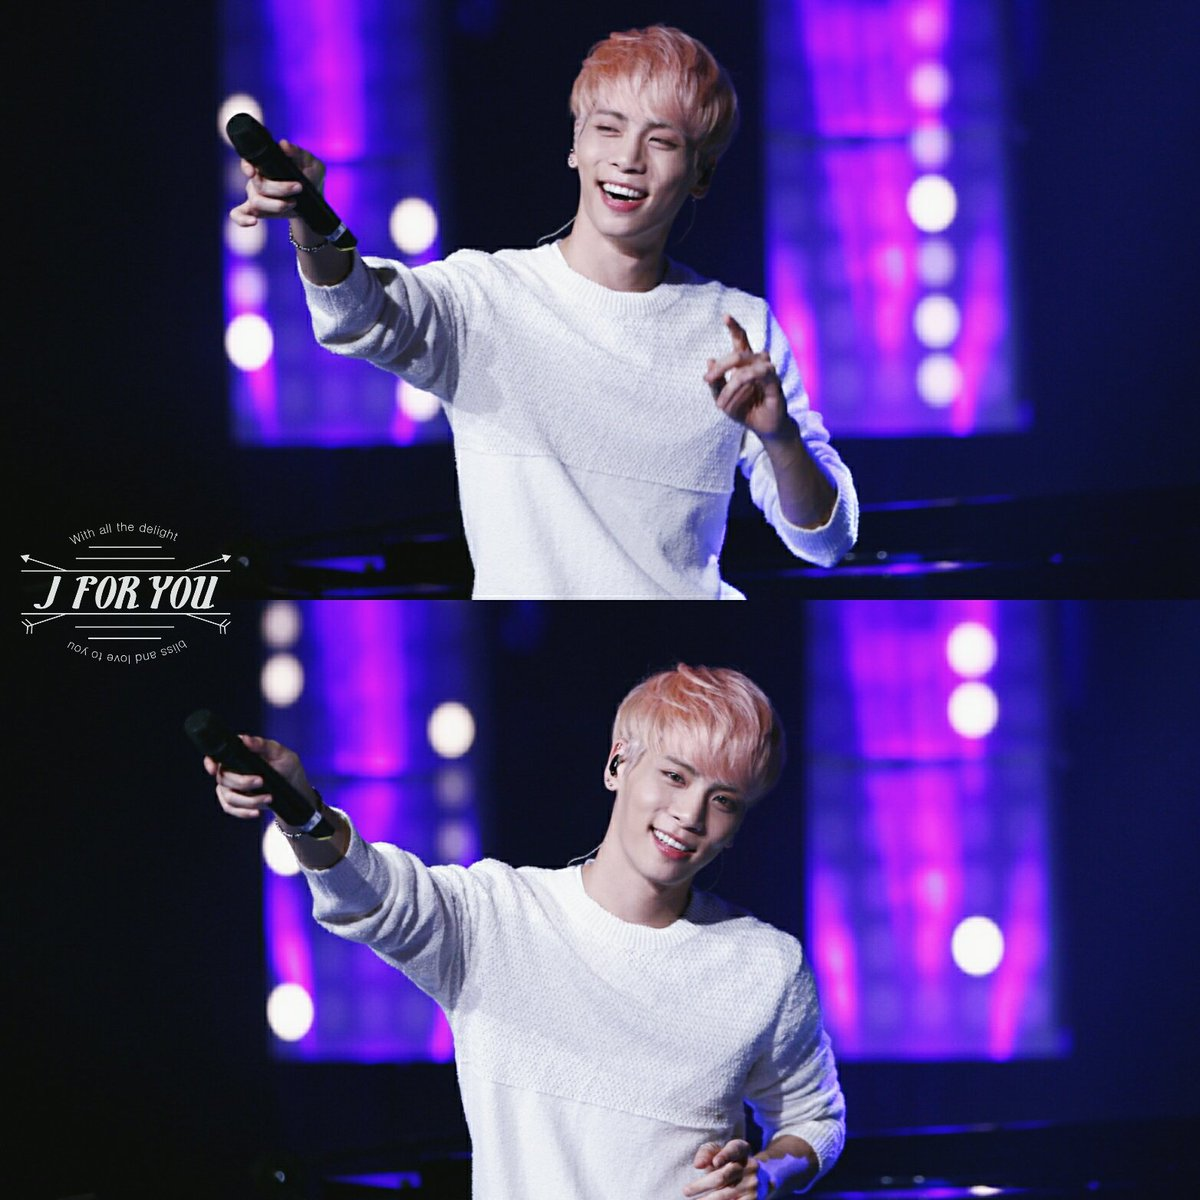 160426 Jonghyun @ MBC Live Concert - Blue Night Cg-g51XUgAASjRR